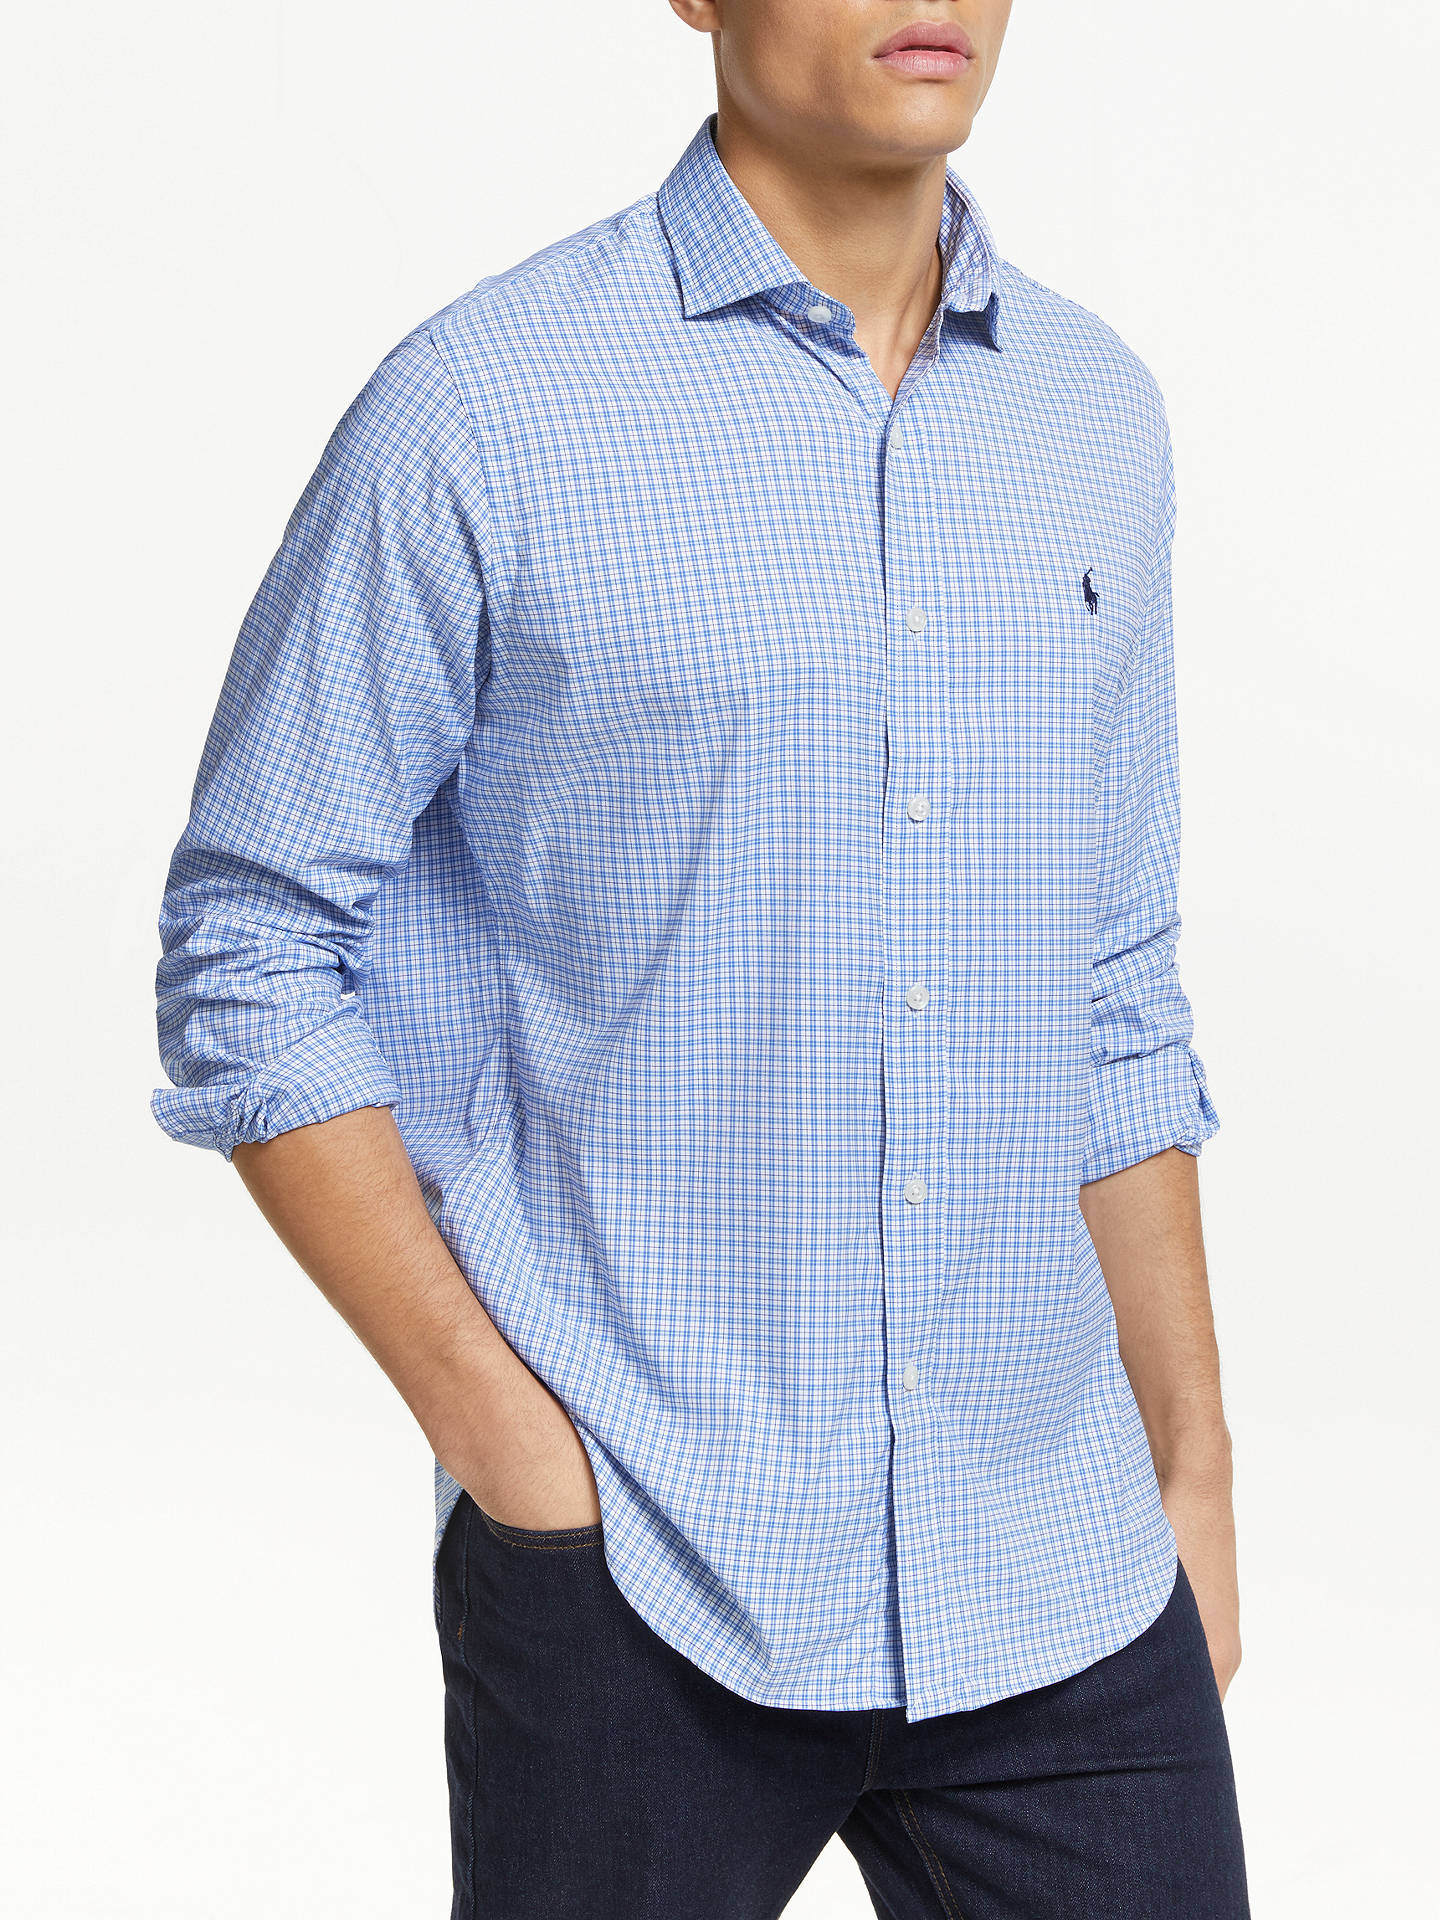 daf87fa6b Buy Polo Golf by Ralph Lauren Check Sports Shirt